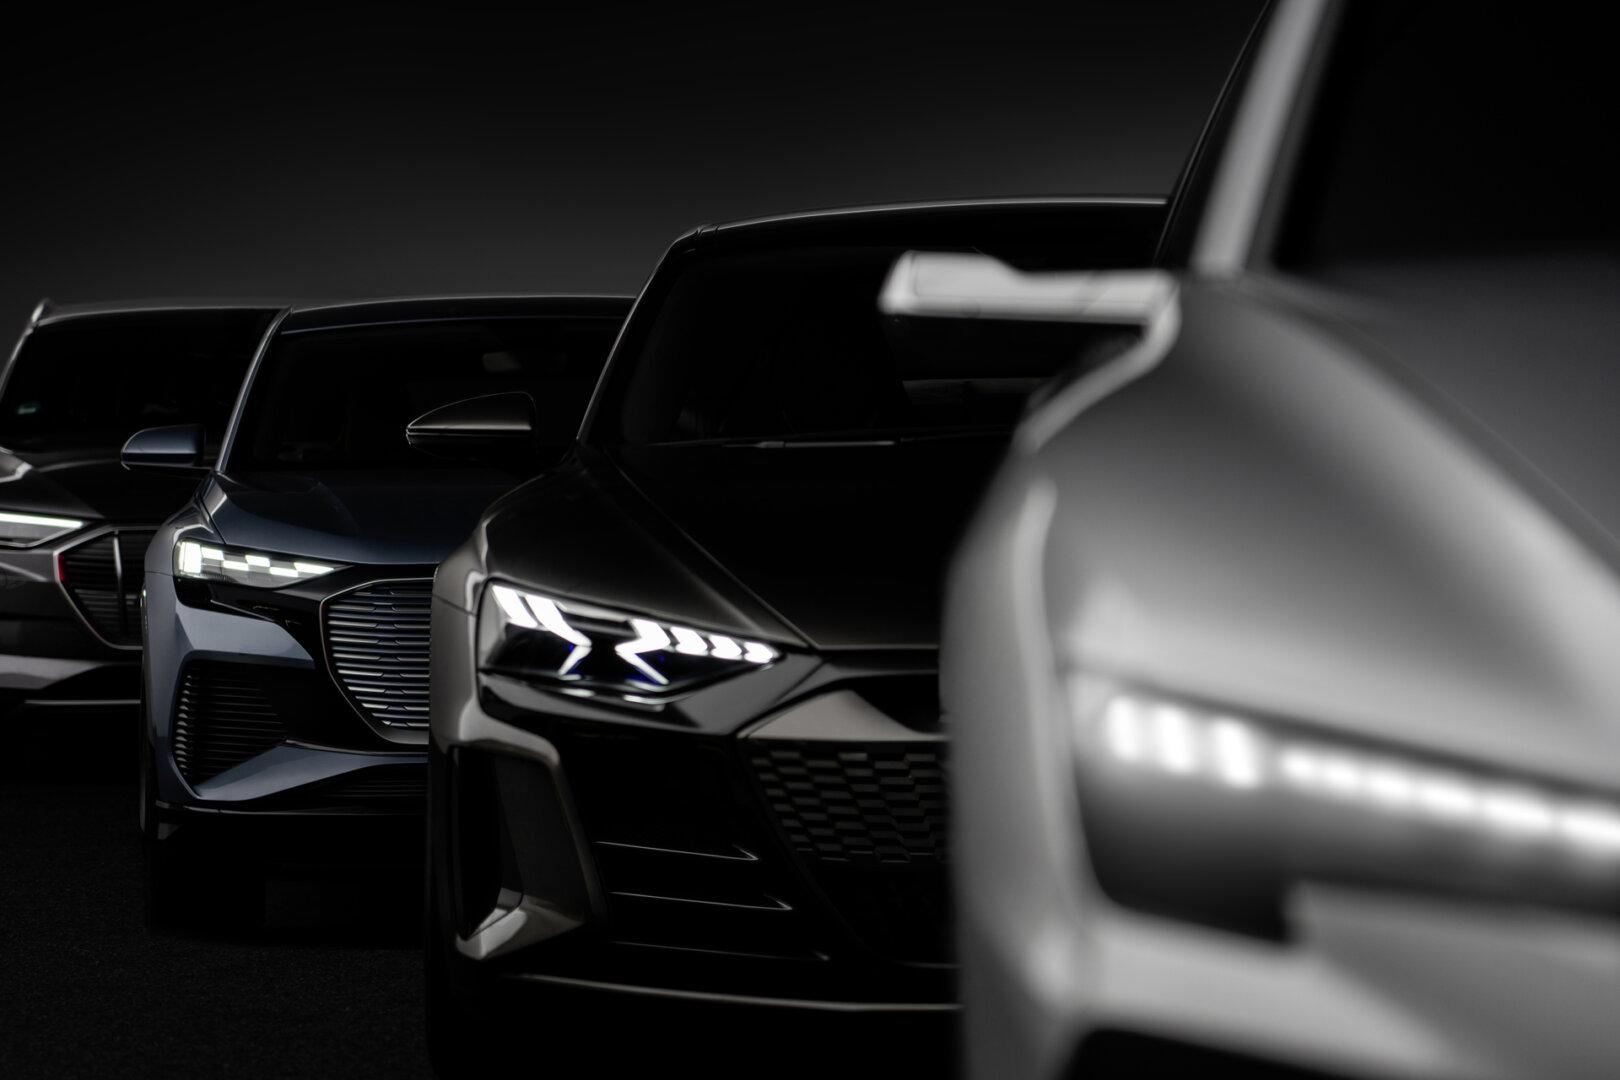 Silberner Audi eTron Elektroauto